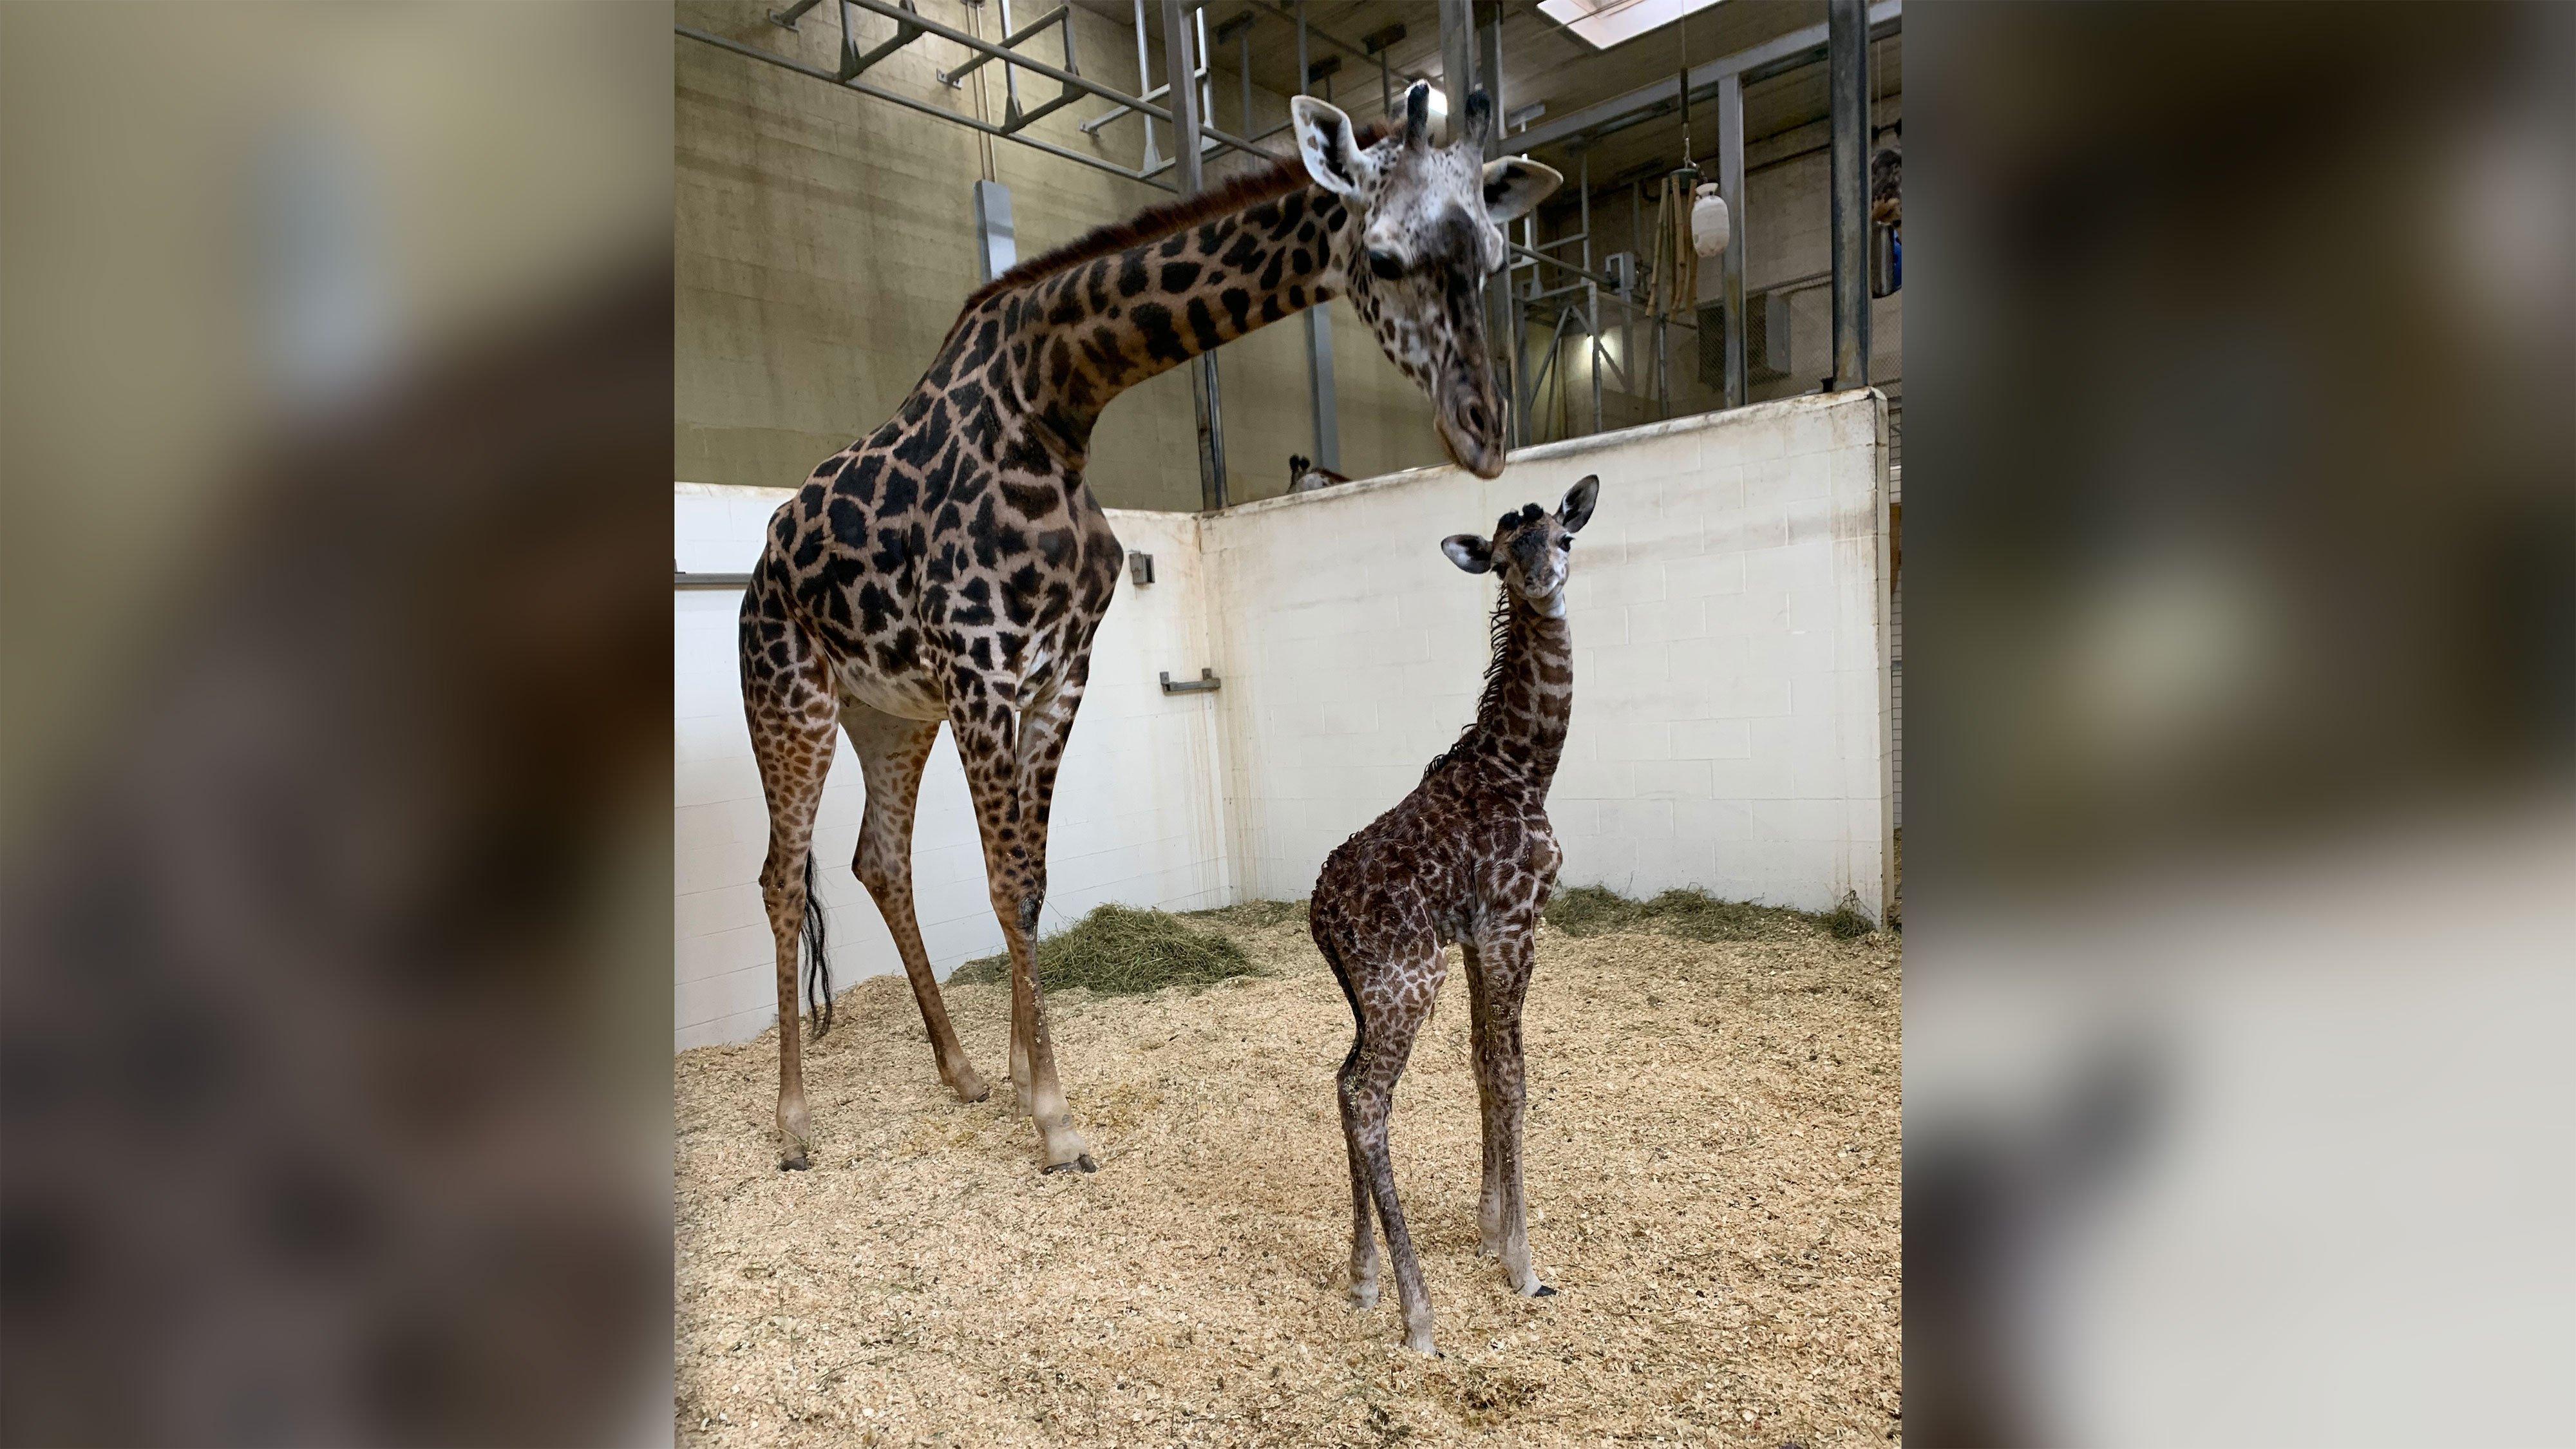 Cincinnati Zoo Welcomes Baby Giraffe Less Than A Week